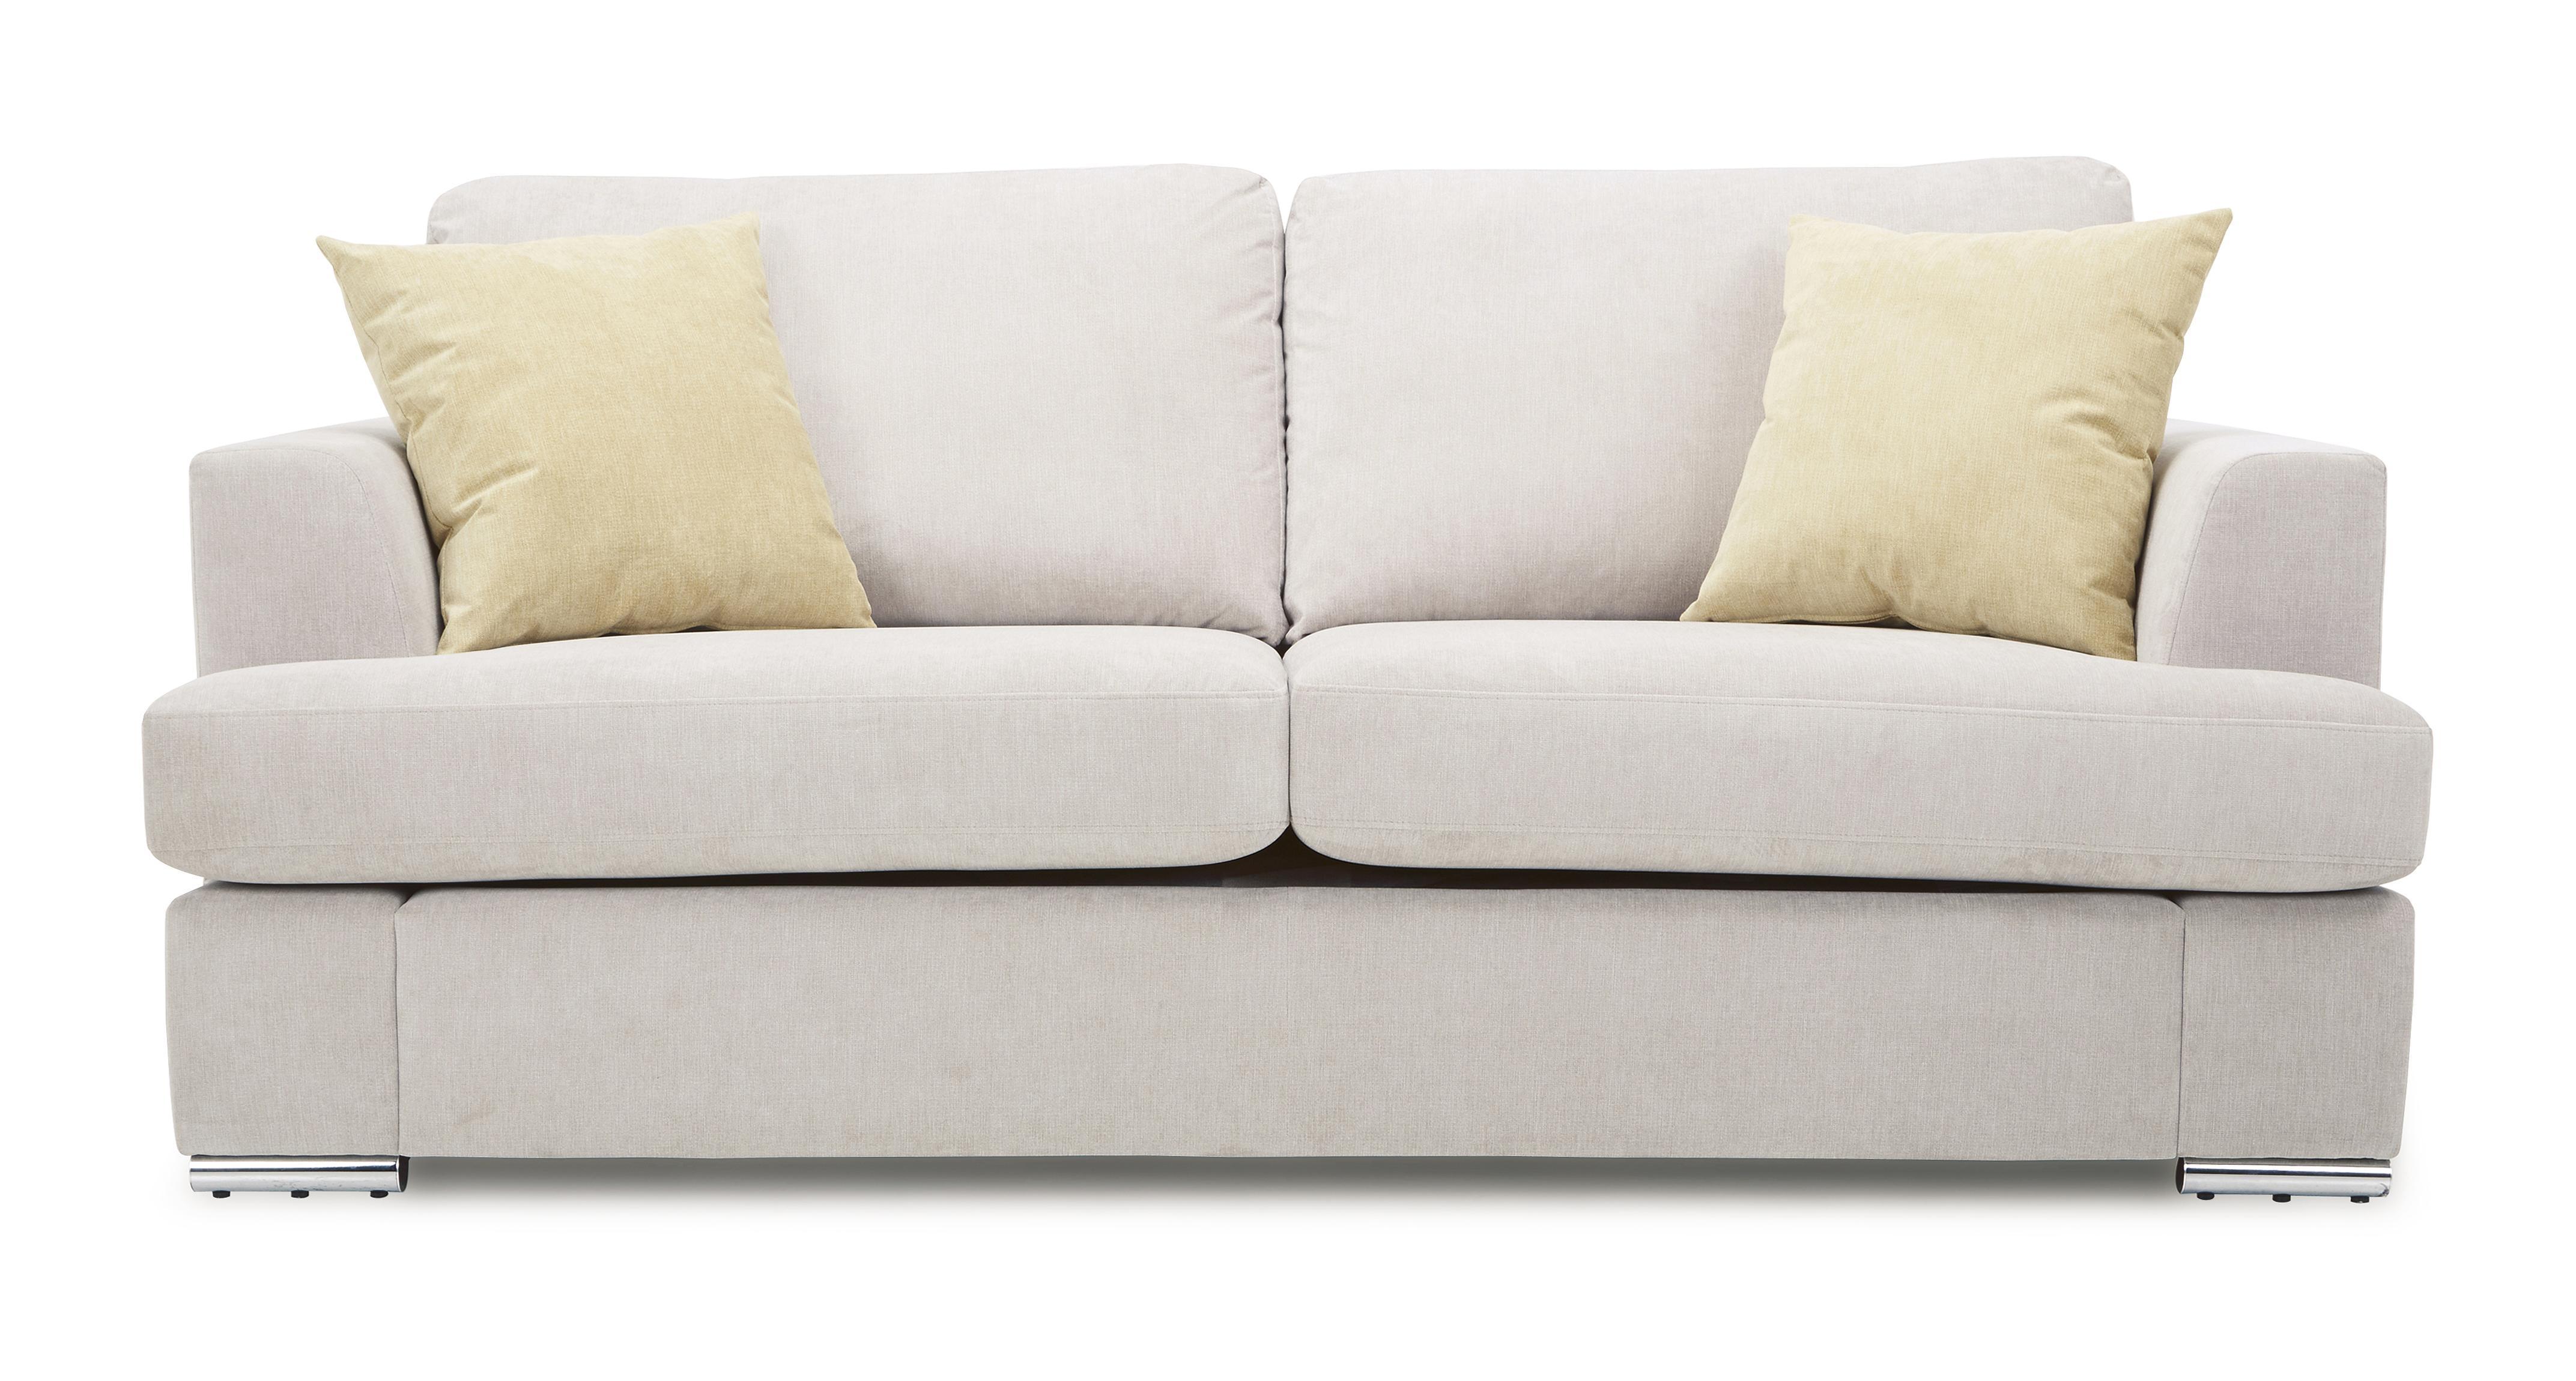 Freya 3 Seater Sofa DFS